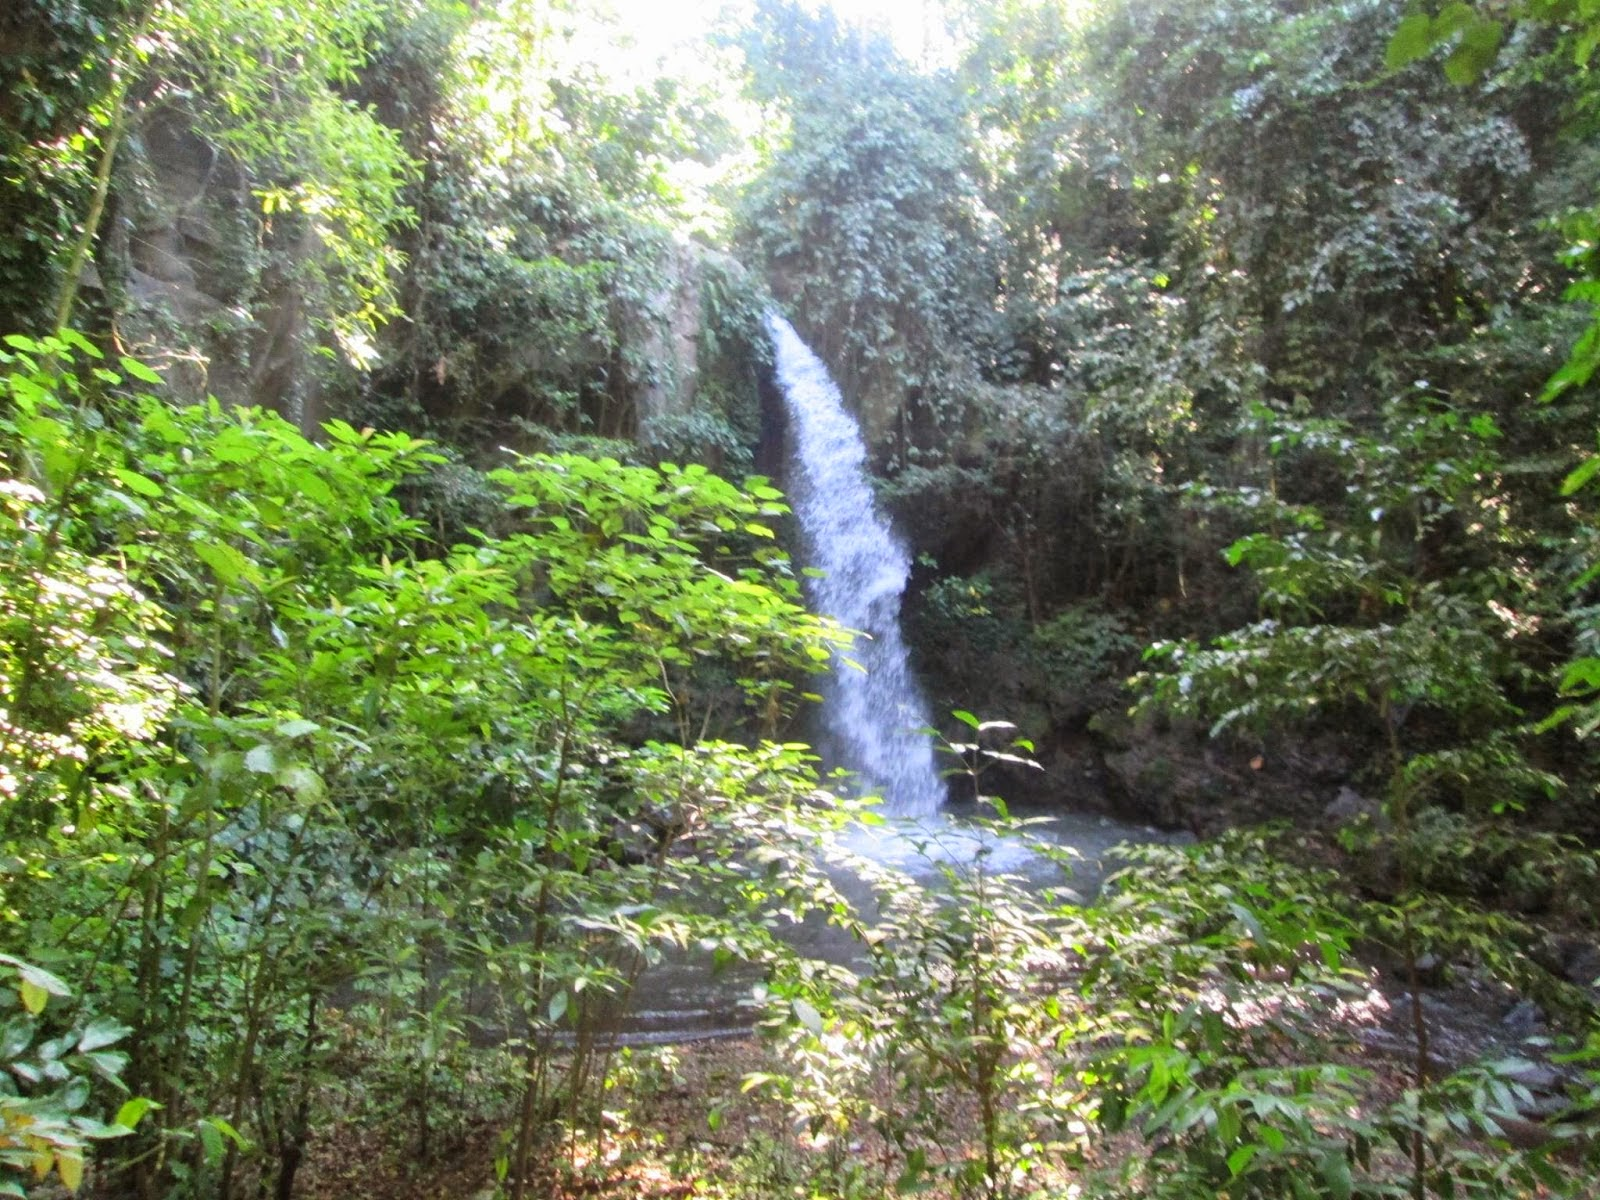 Air terjun Selogiri, Kalipuro, Banyuwangi.